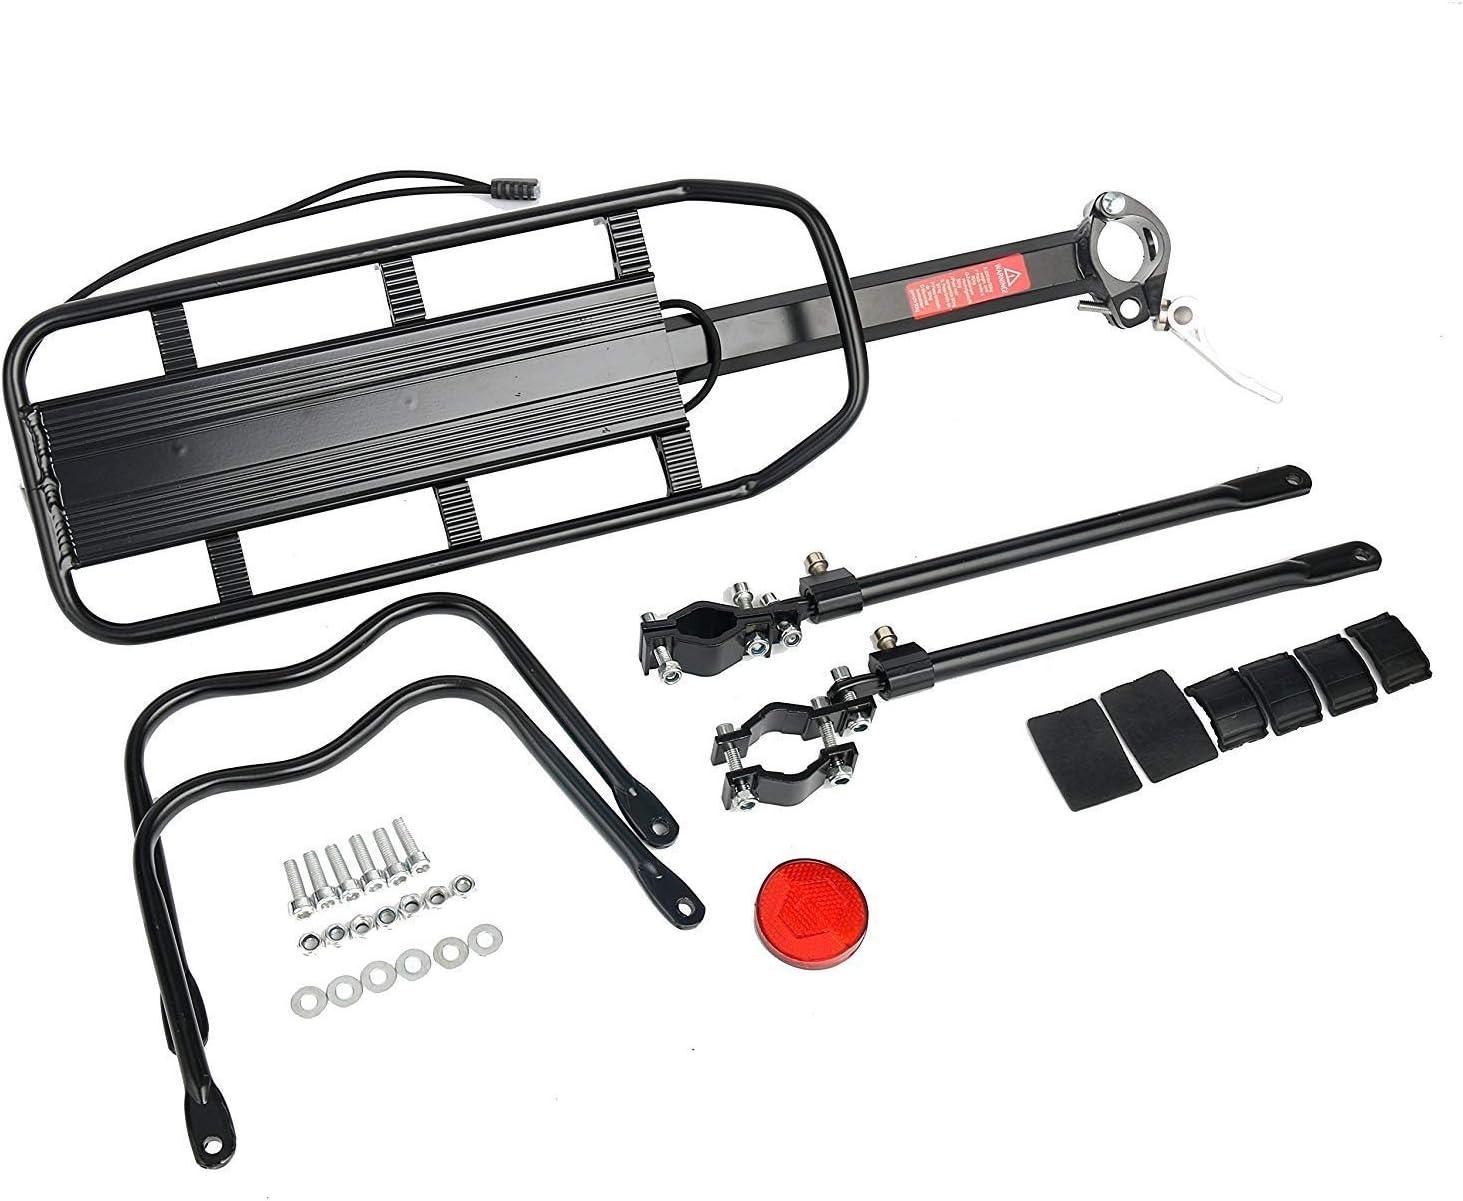 Amarine Made 110 Lbs Capacity Aluminum Alloy Bicycle Rear Rack Adjustable Pannier Bike Luggage Cargo Rack Bicycle Carrier Racks